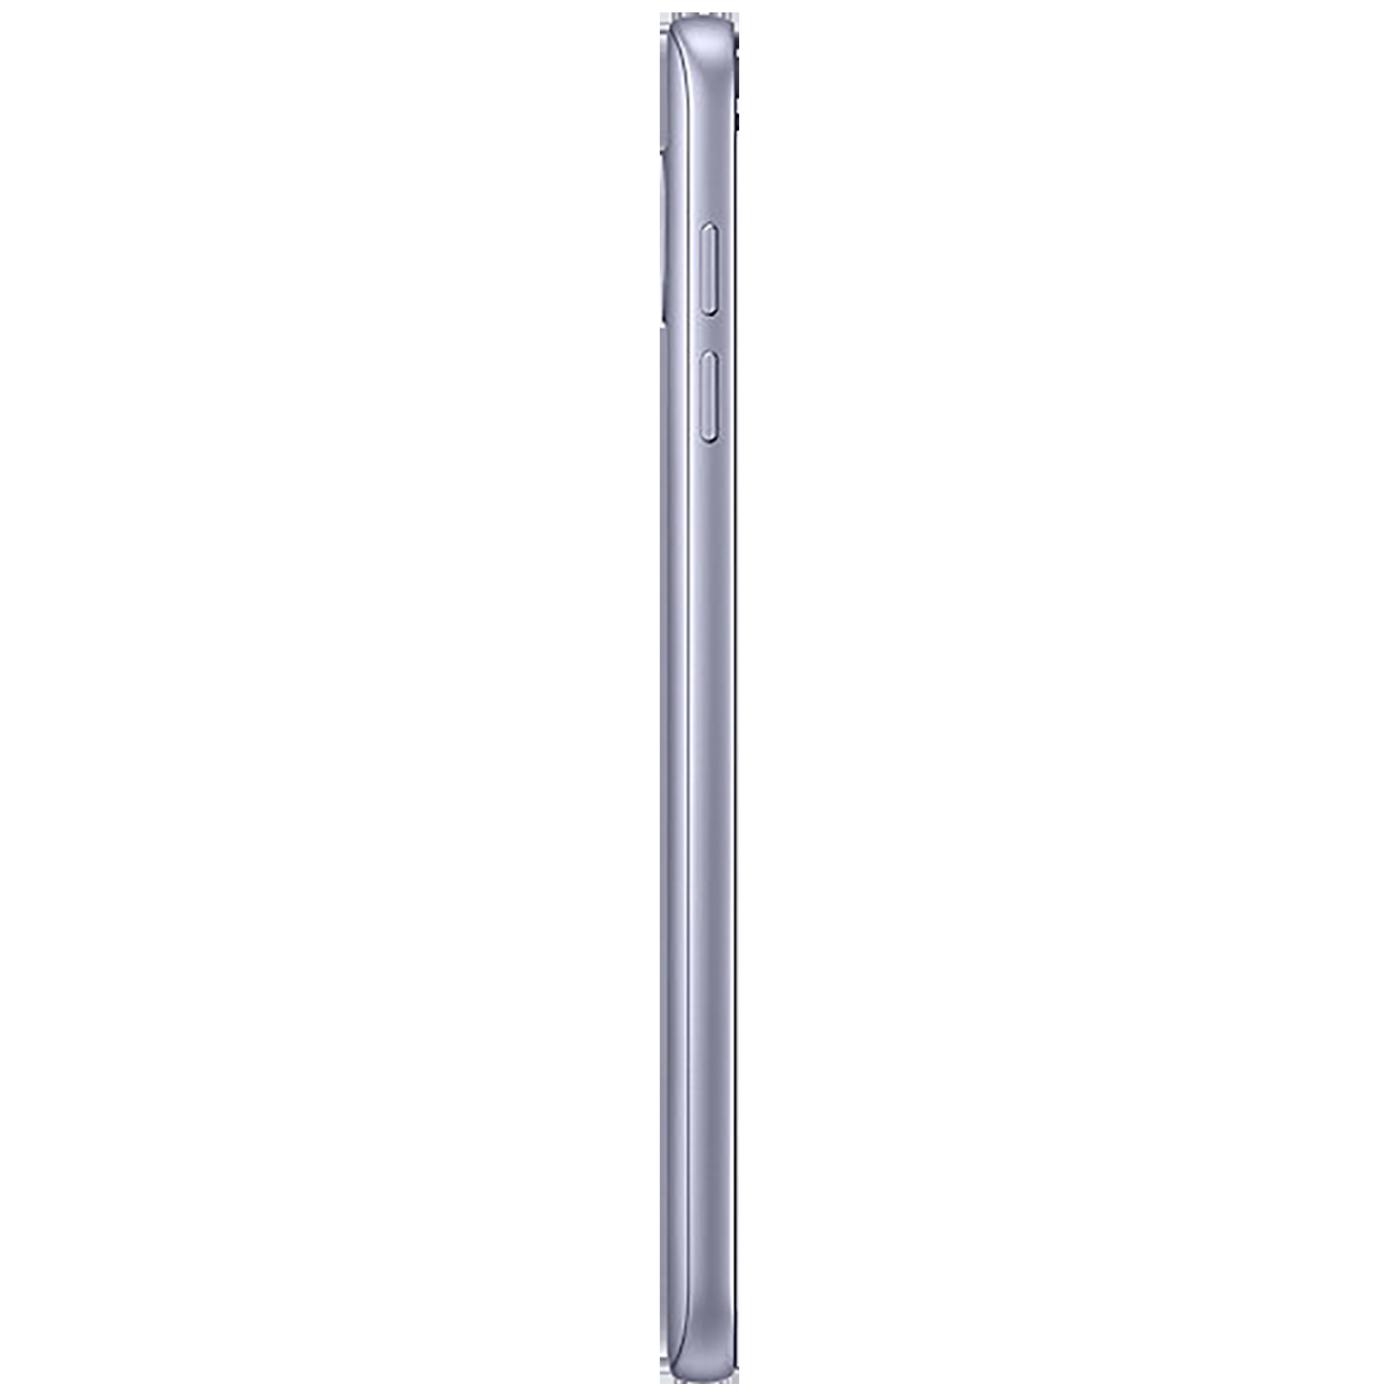 Galaxy J4 (2018) Lavender